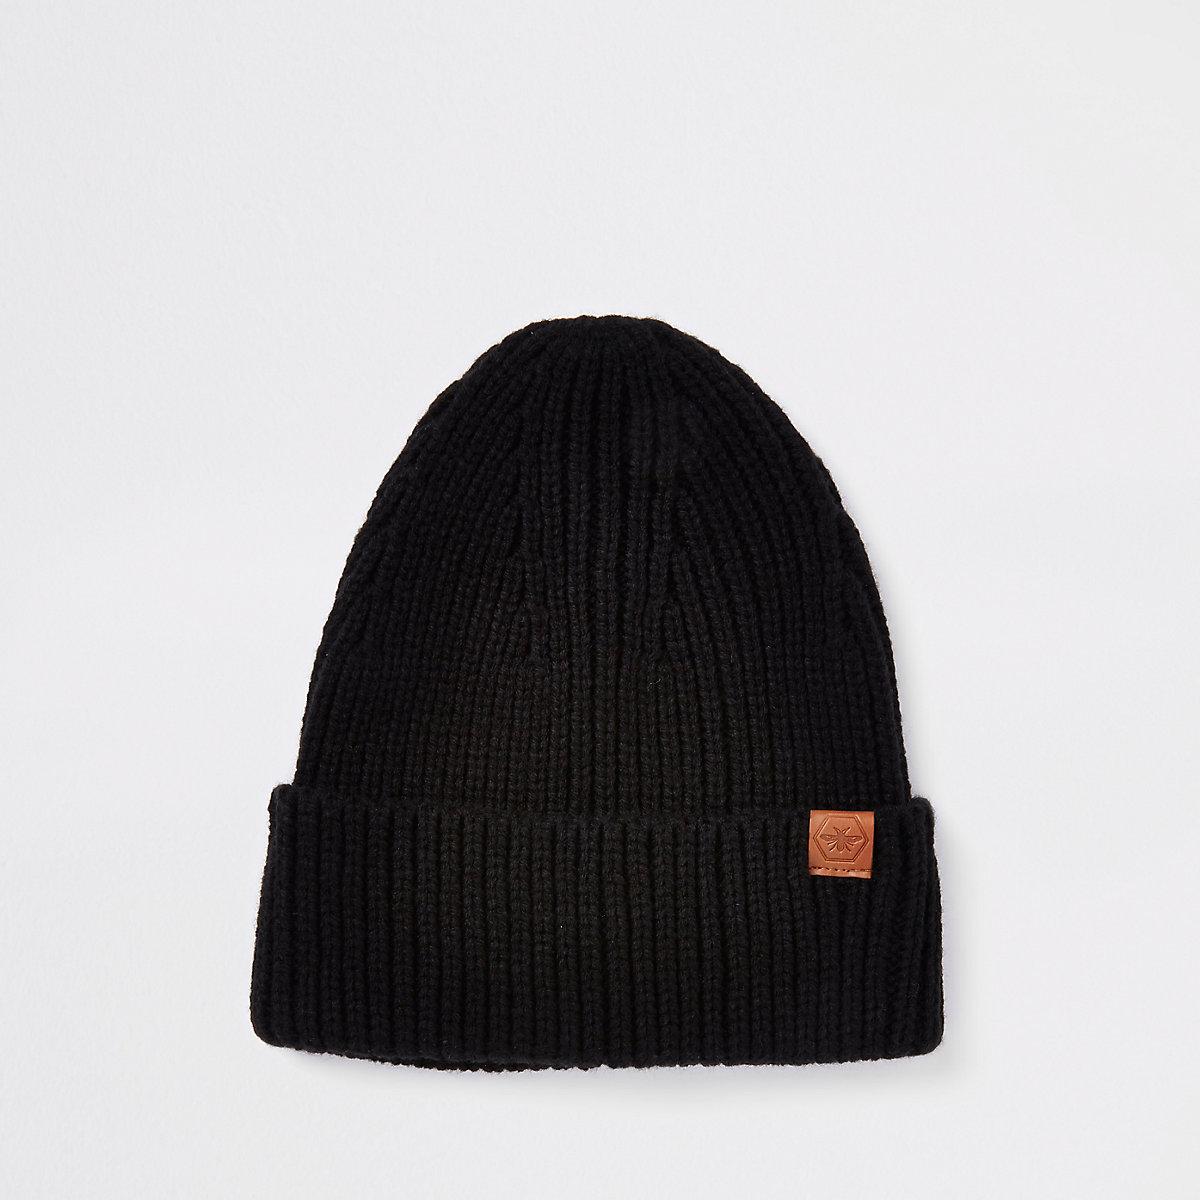 Black fisherman knit beanie hat